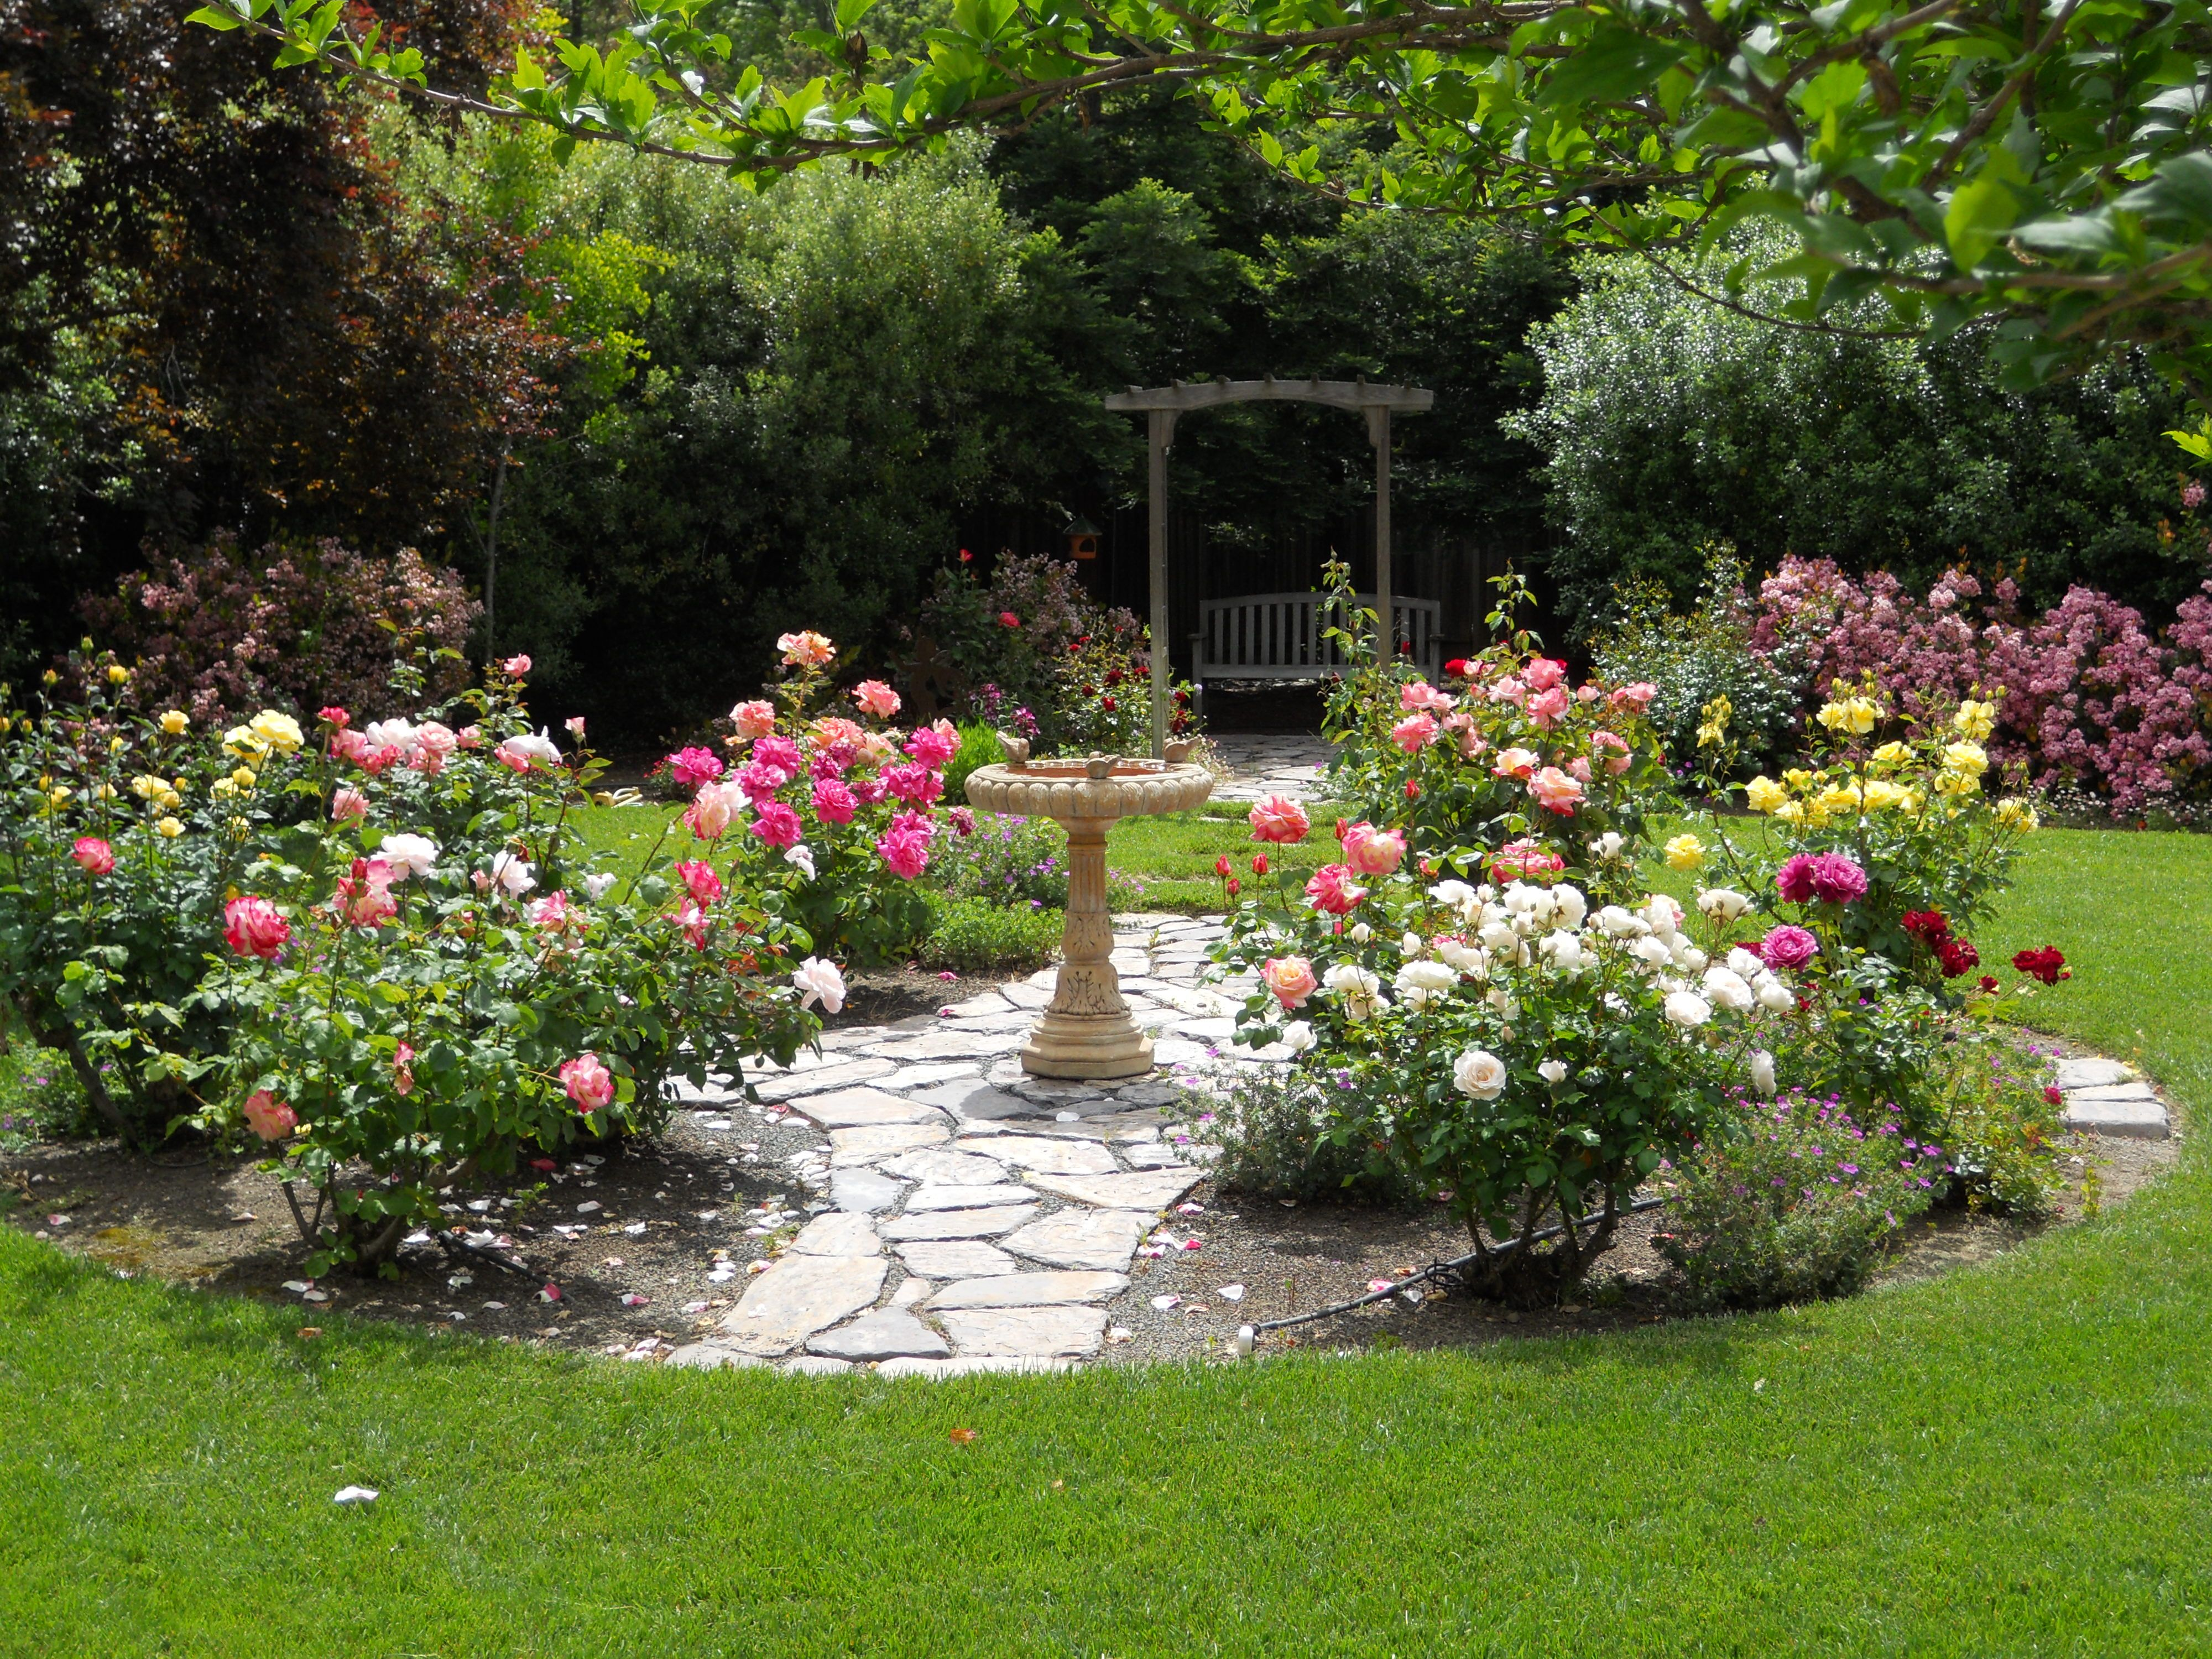 Small Backyard Flower Garden Plans - Garden Design